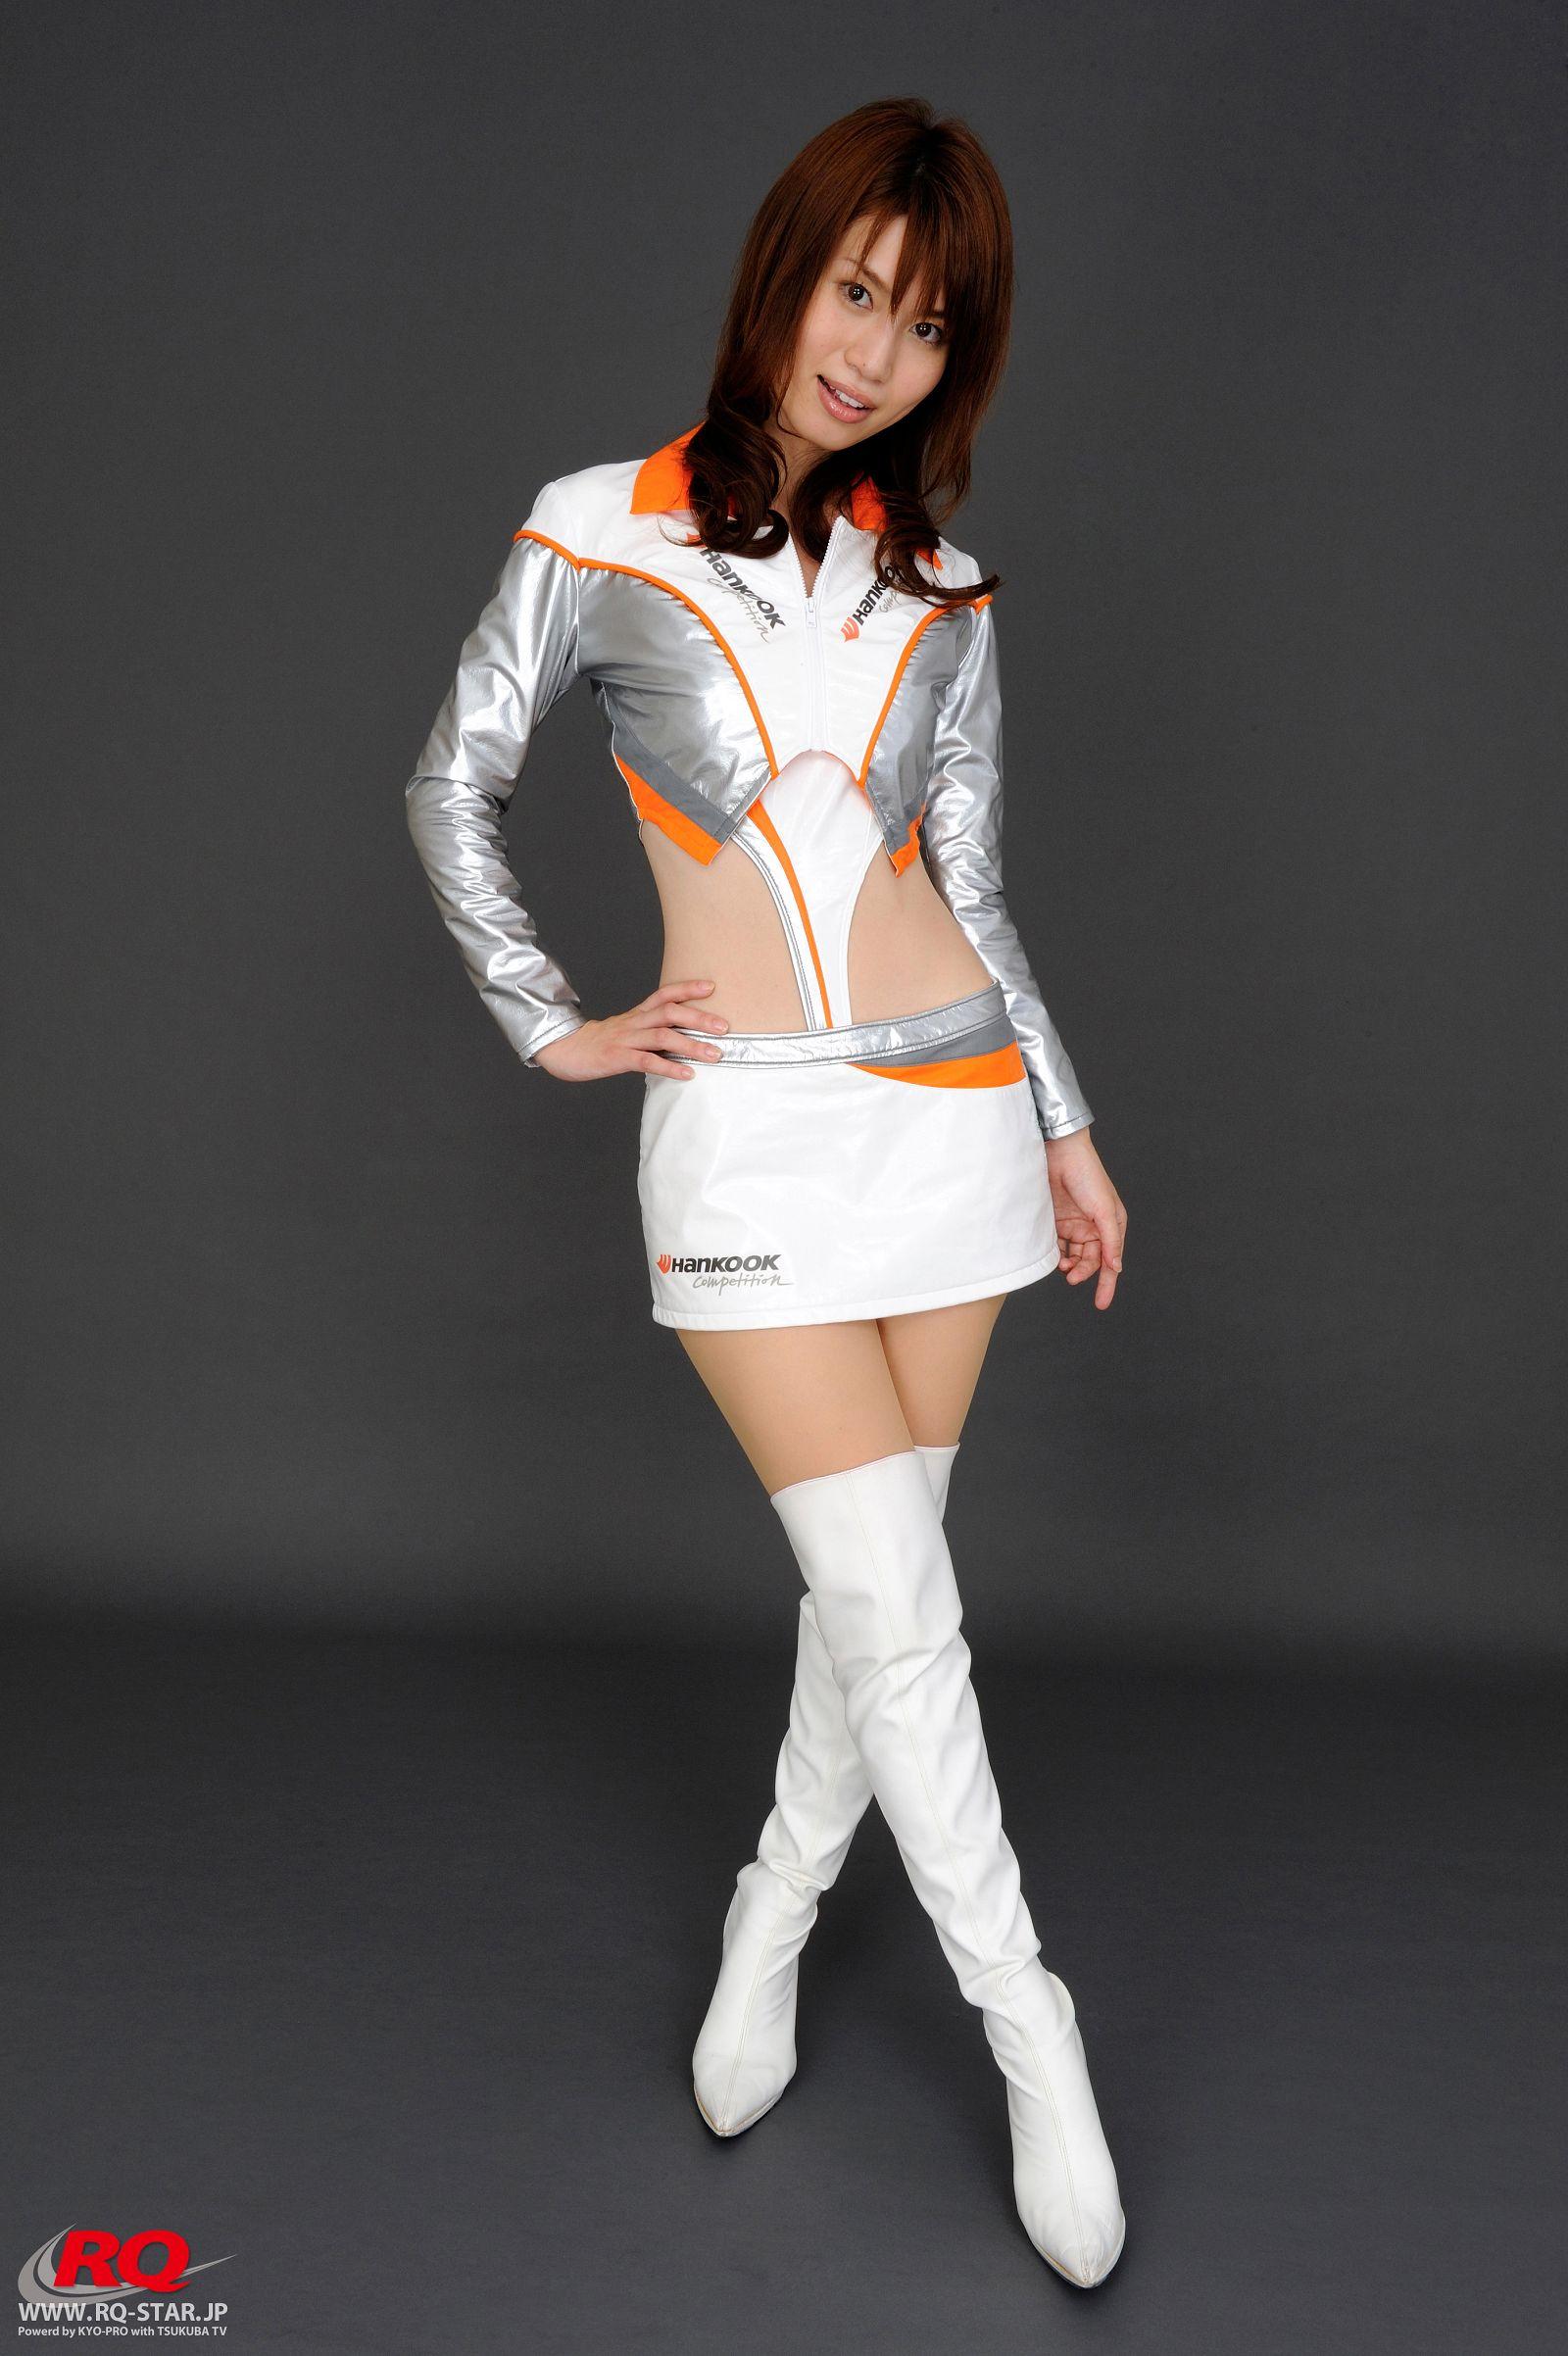 [RQ STAR美女] NO.0007 Aki Kogure 小暮あき Race Queen 2008 Hankook[111P] RQ STAR 第1张